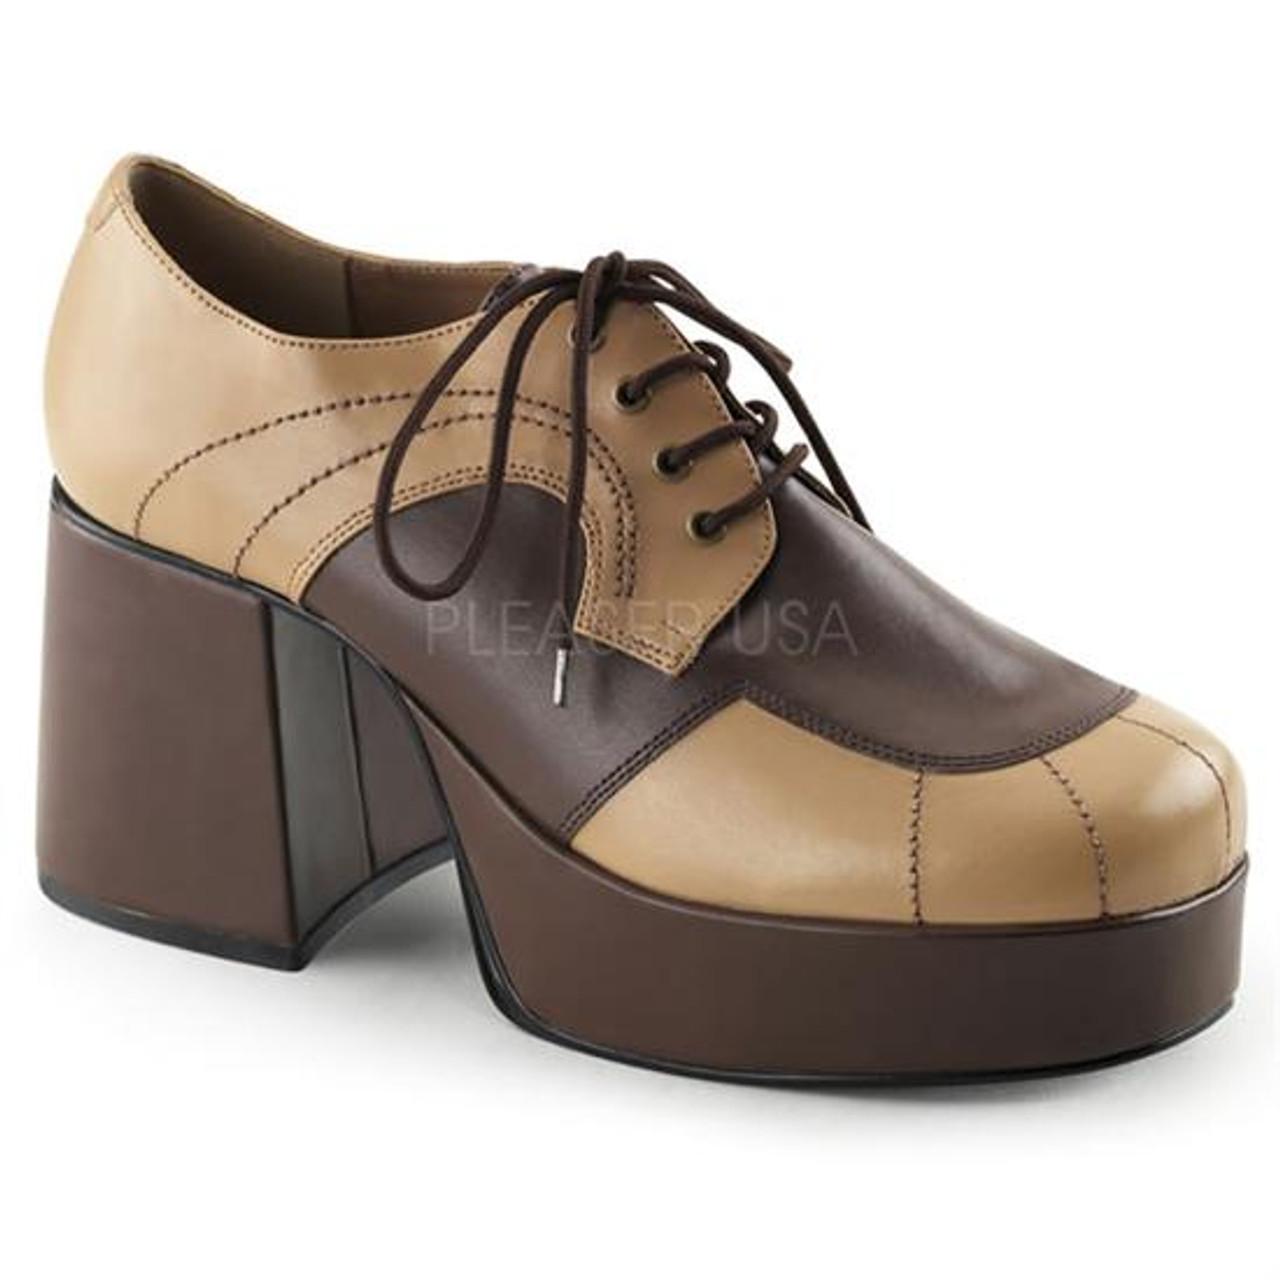 mens dress shoes 1.5 inch heel